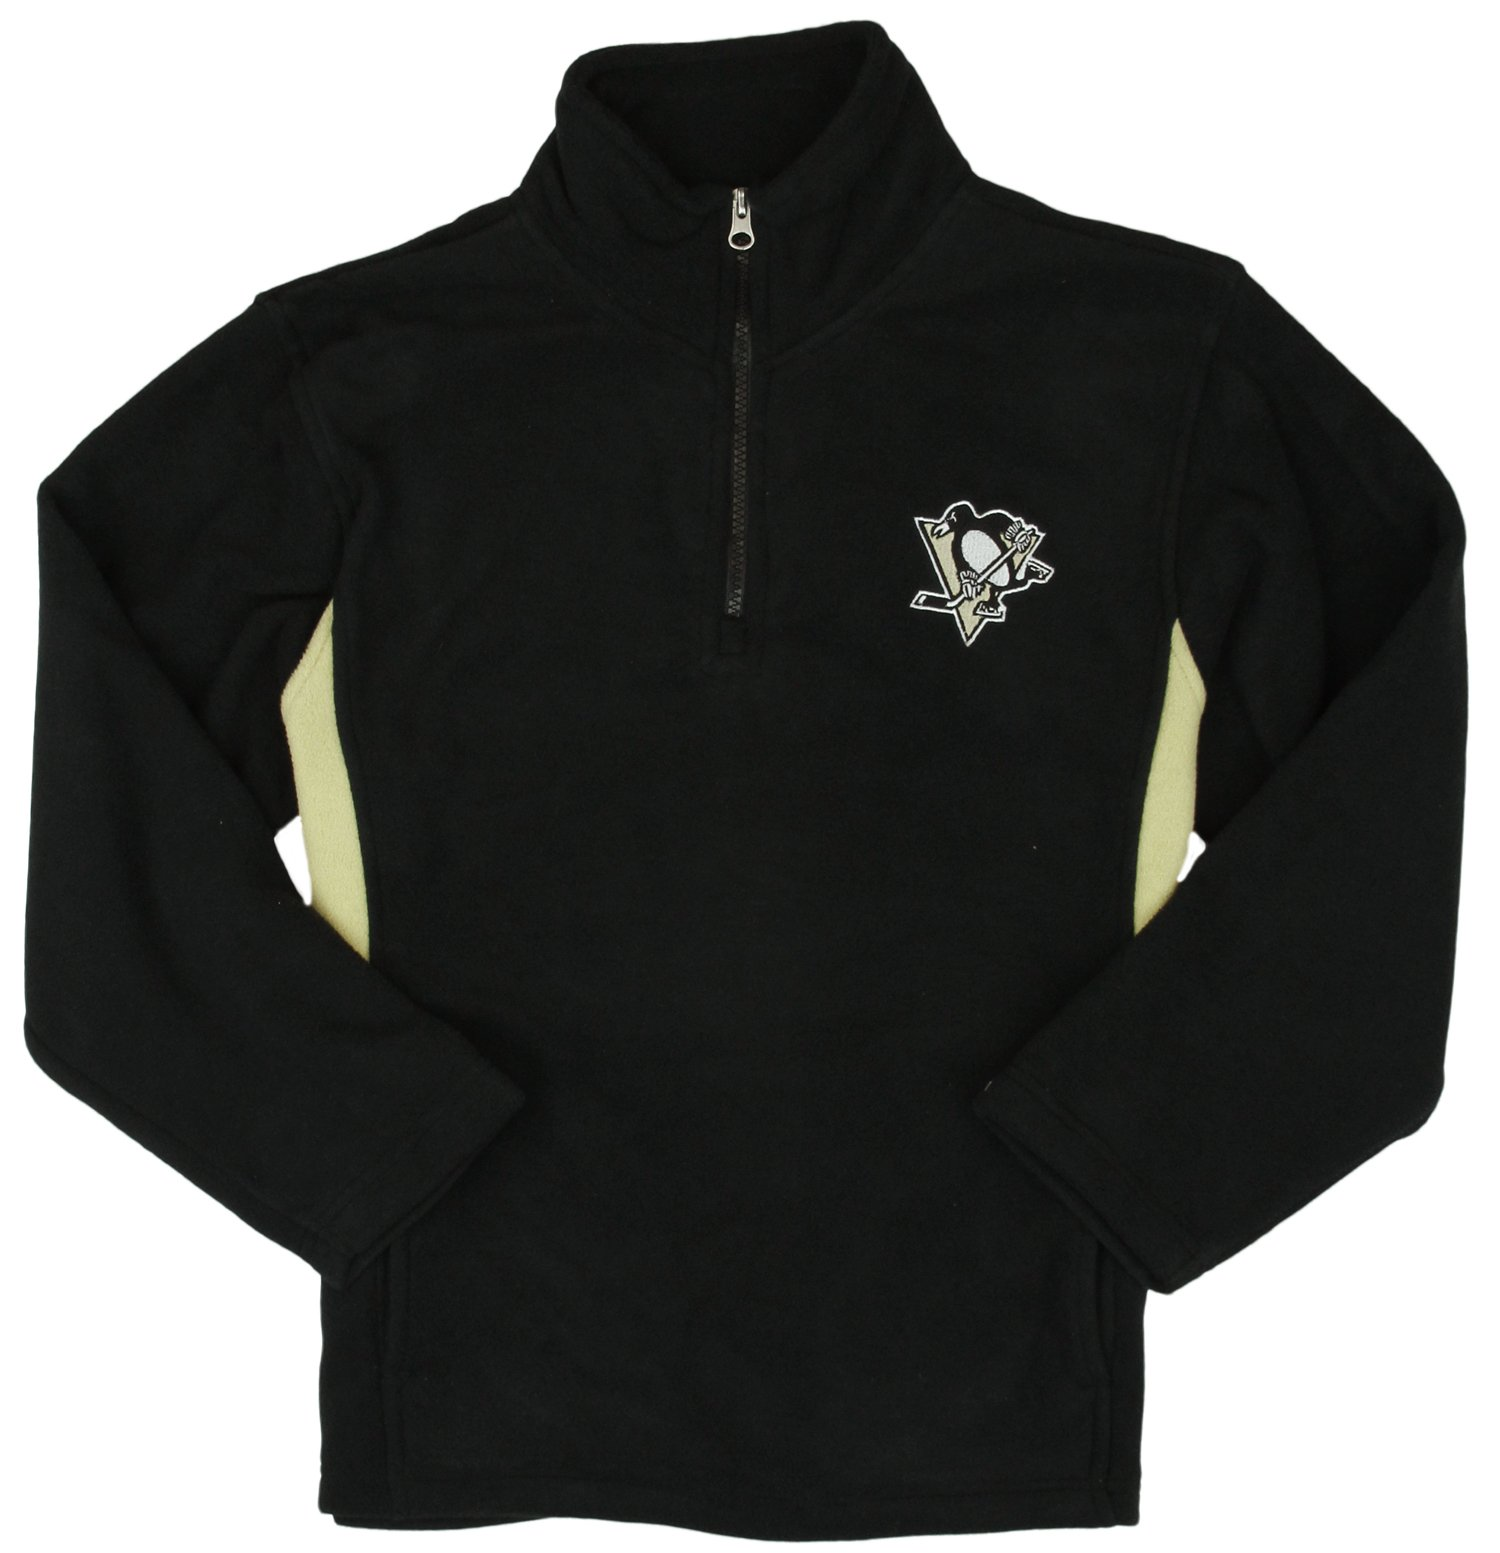 NHL Hockey Kids   Youth Pittsburgh Penguins Fleece Jacket Black by